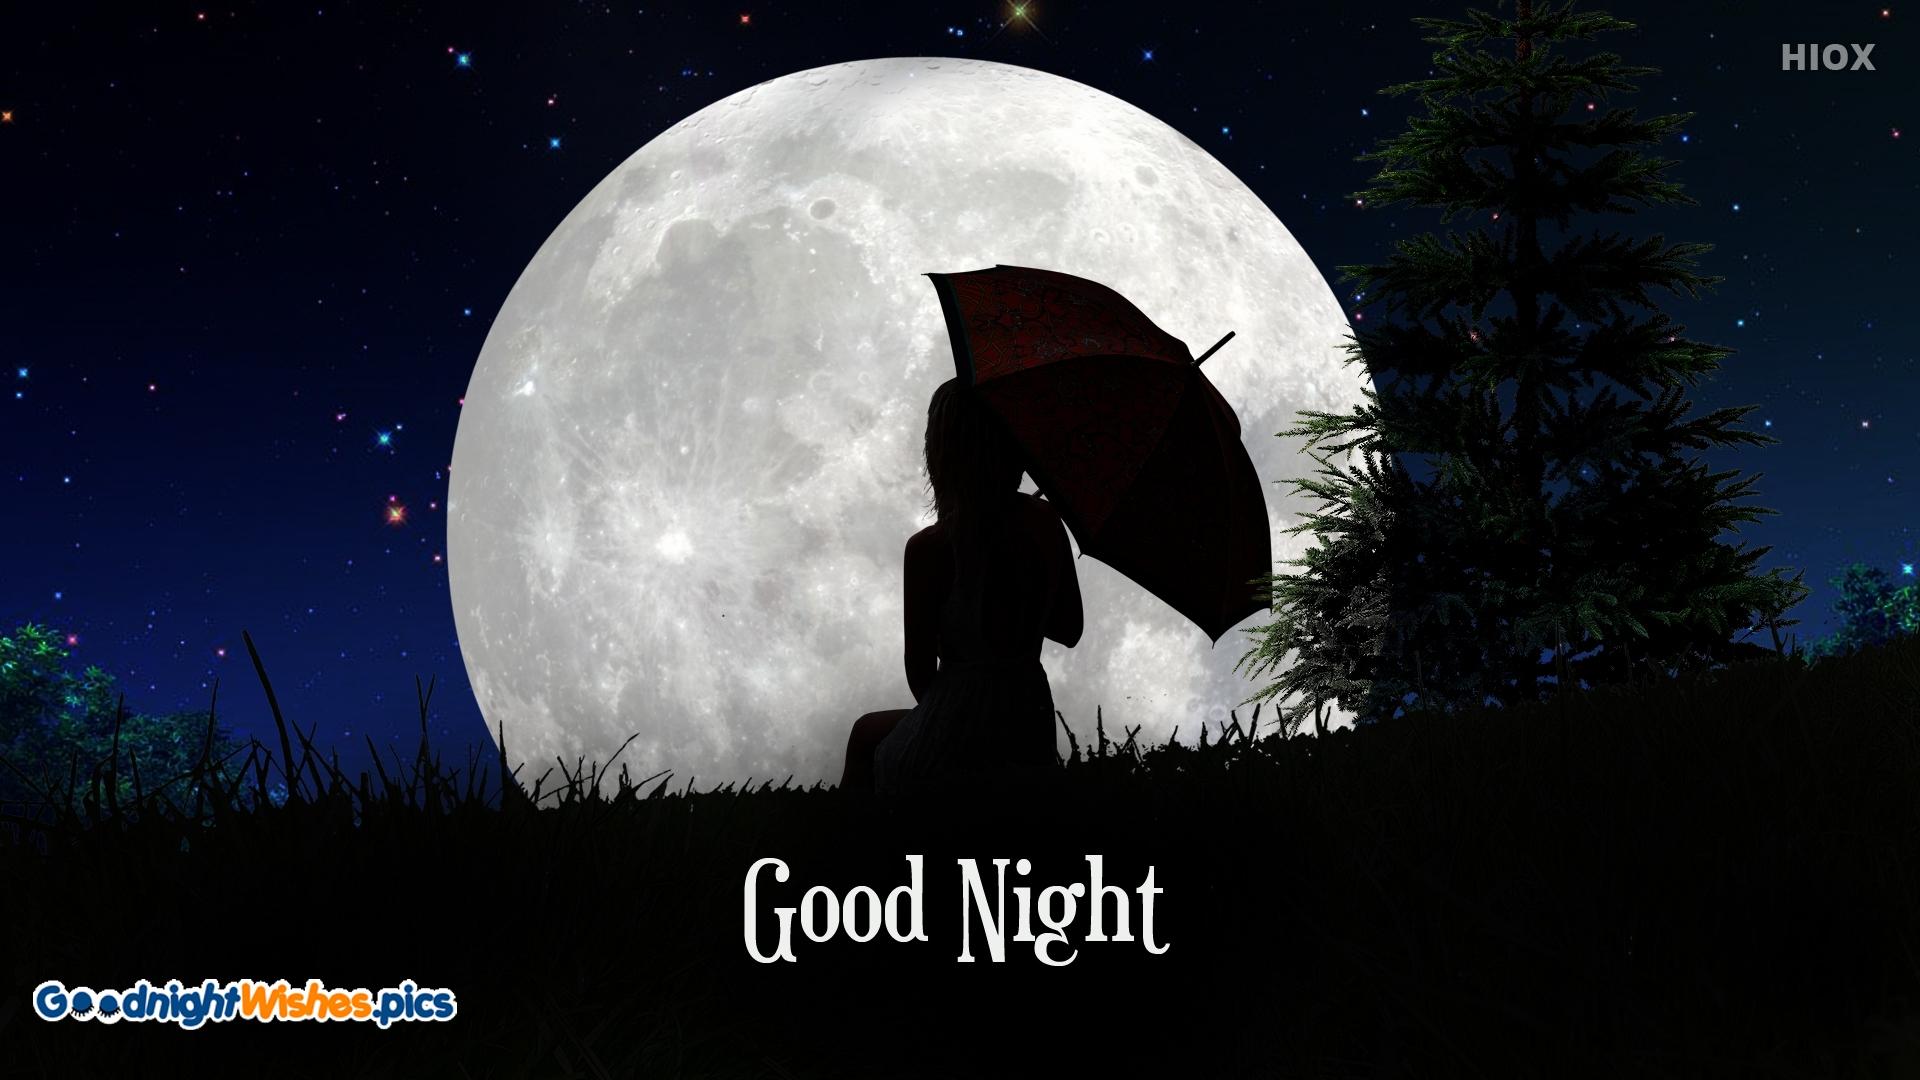 Good Night With Umbrella